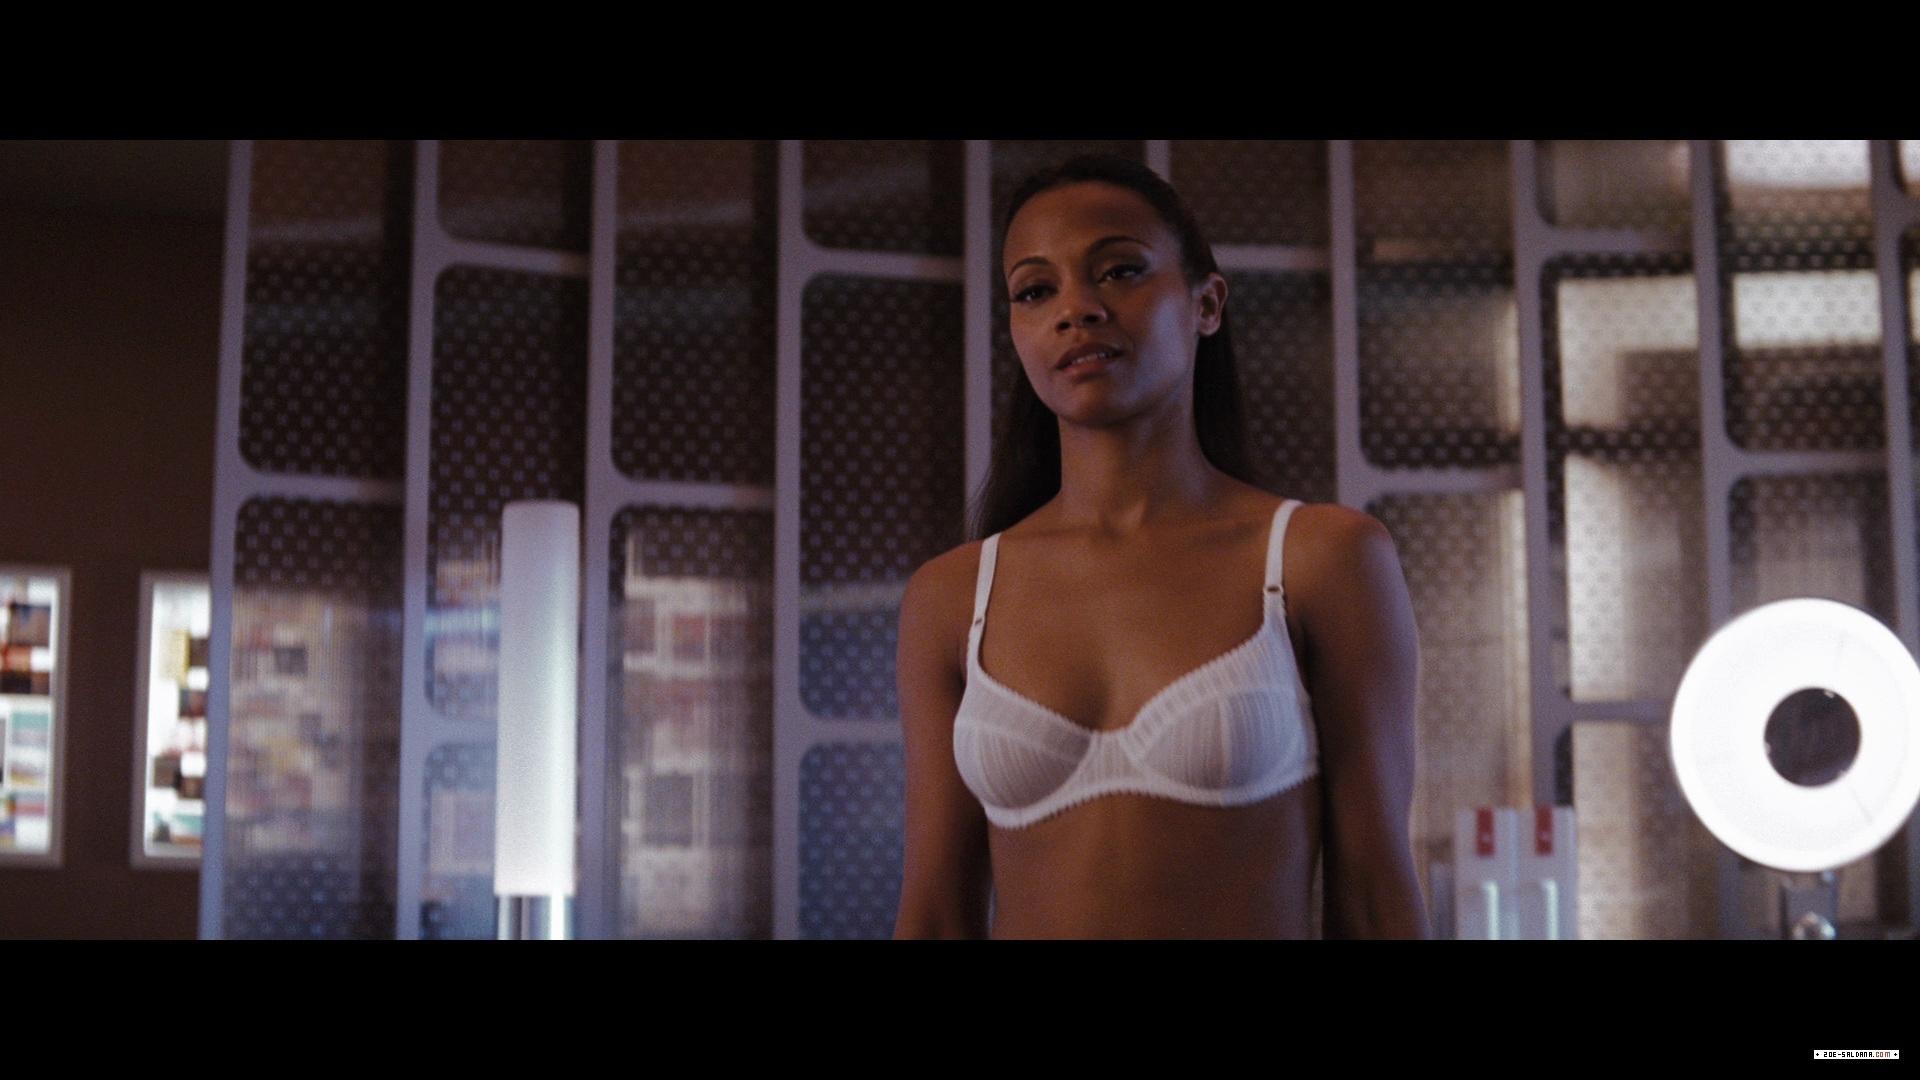 Zoe-Saldana-Star-Trek-screencaps-zoe-saldana-9859917-1920-1080 jpgZoe Saldana Star Trek